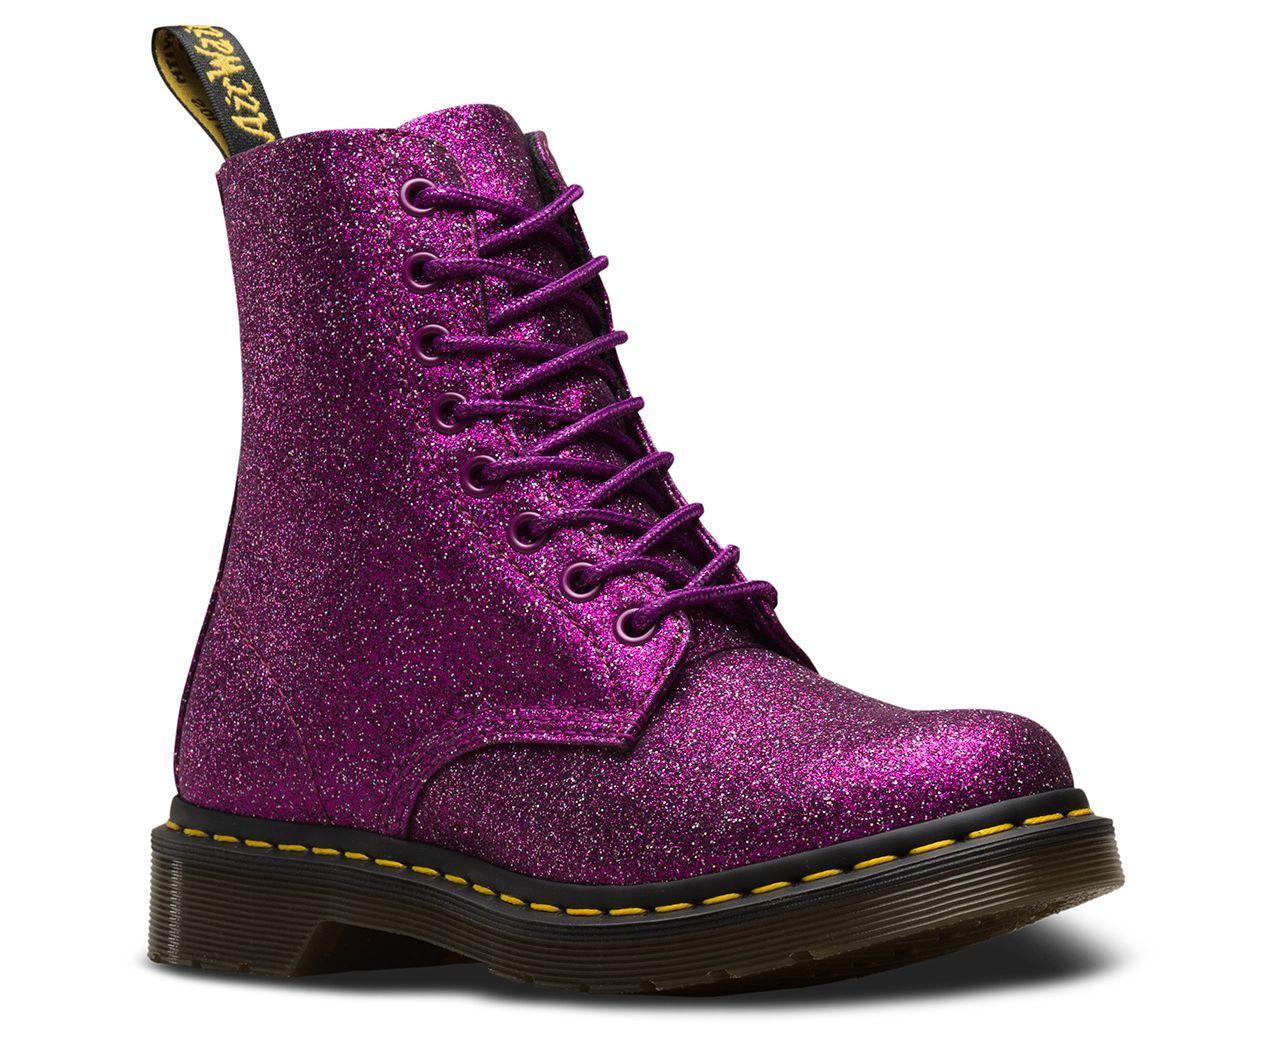 Dr martens 1460 pascal fine glitter | Boots, Doc martens